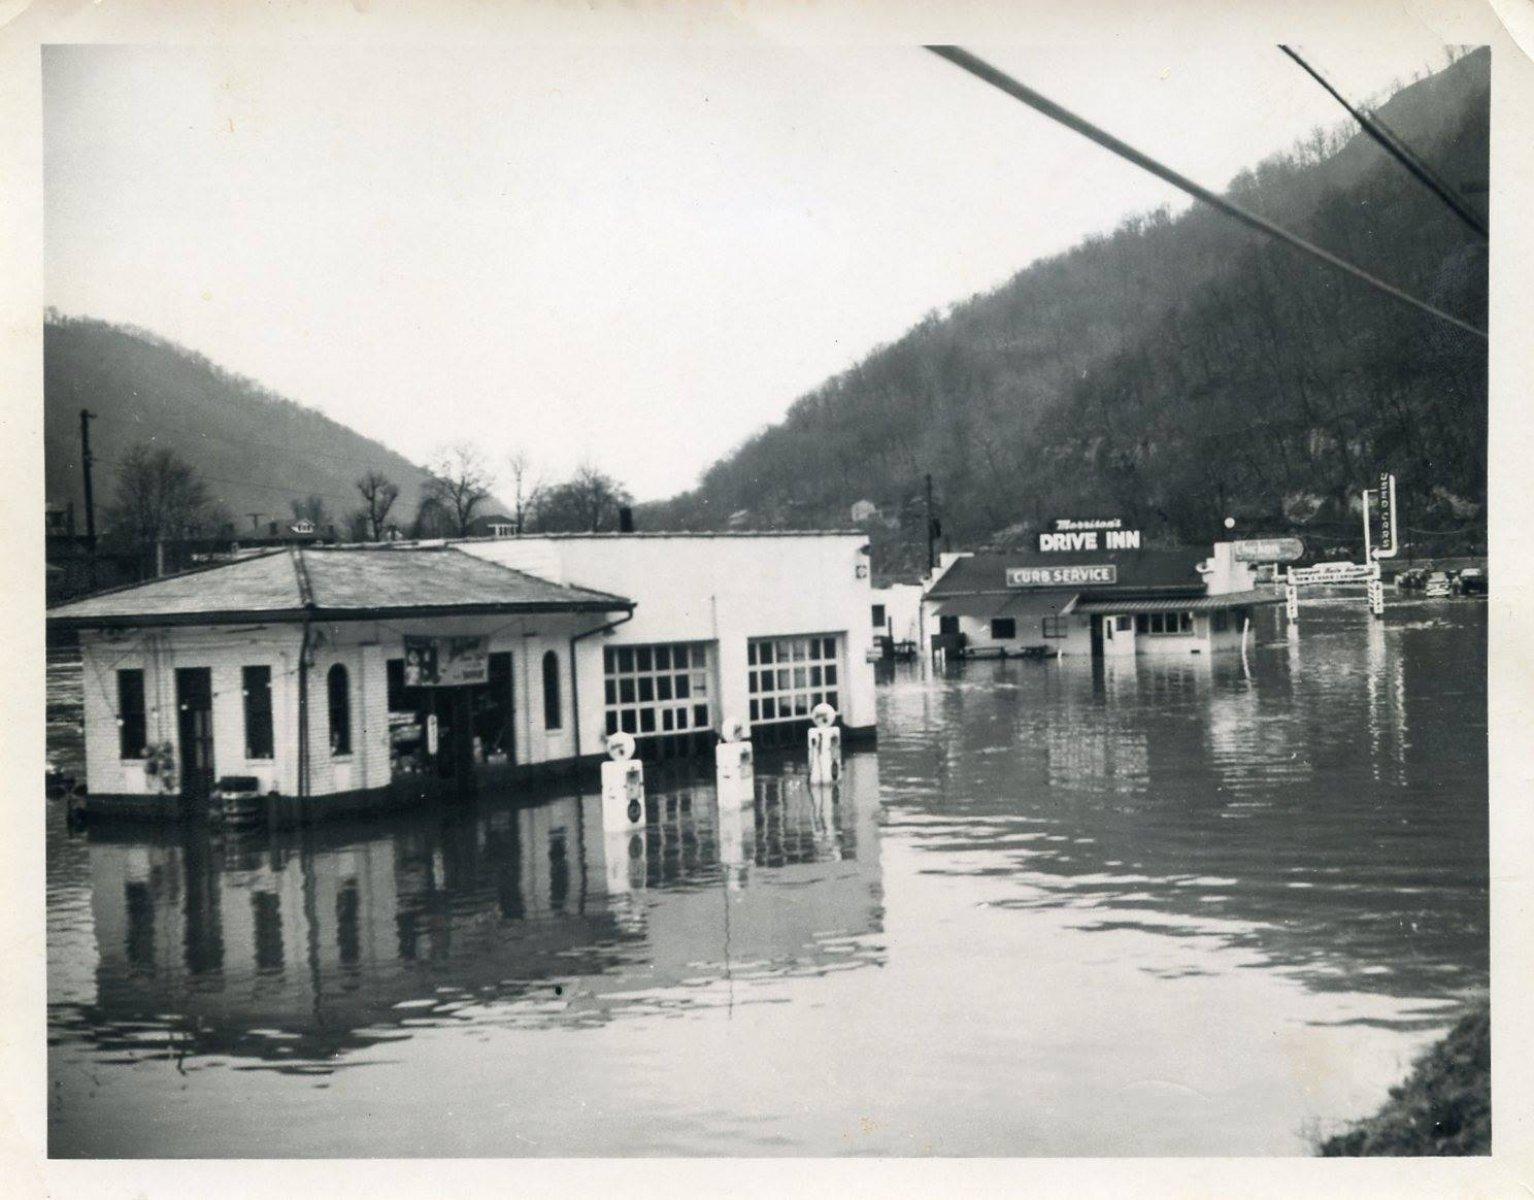 1950s Logan County, WV Flooding